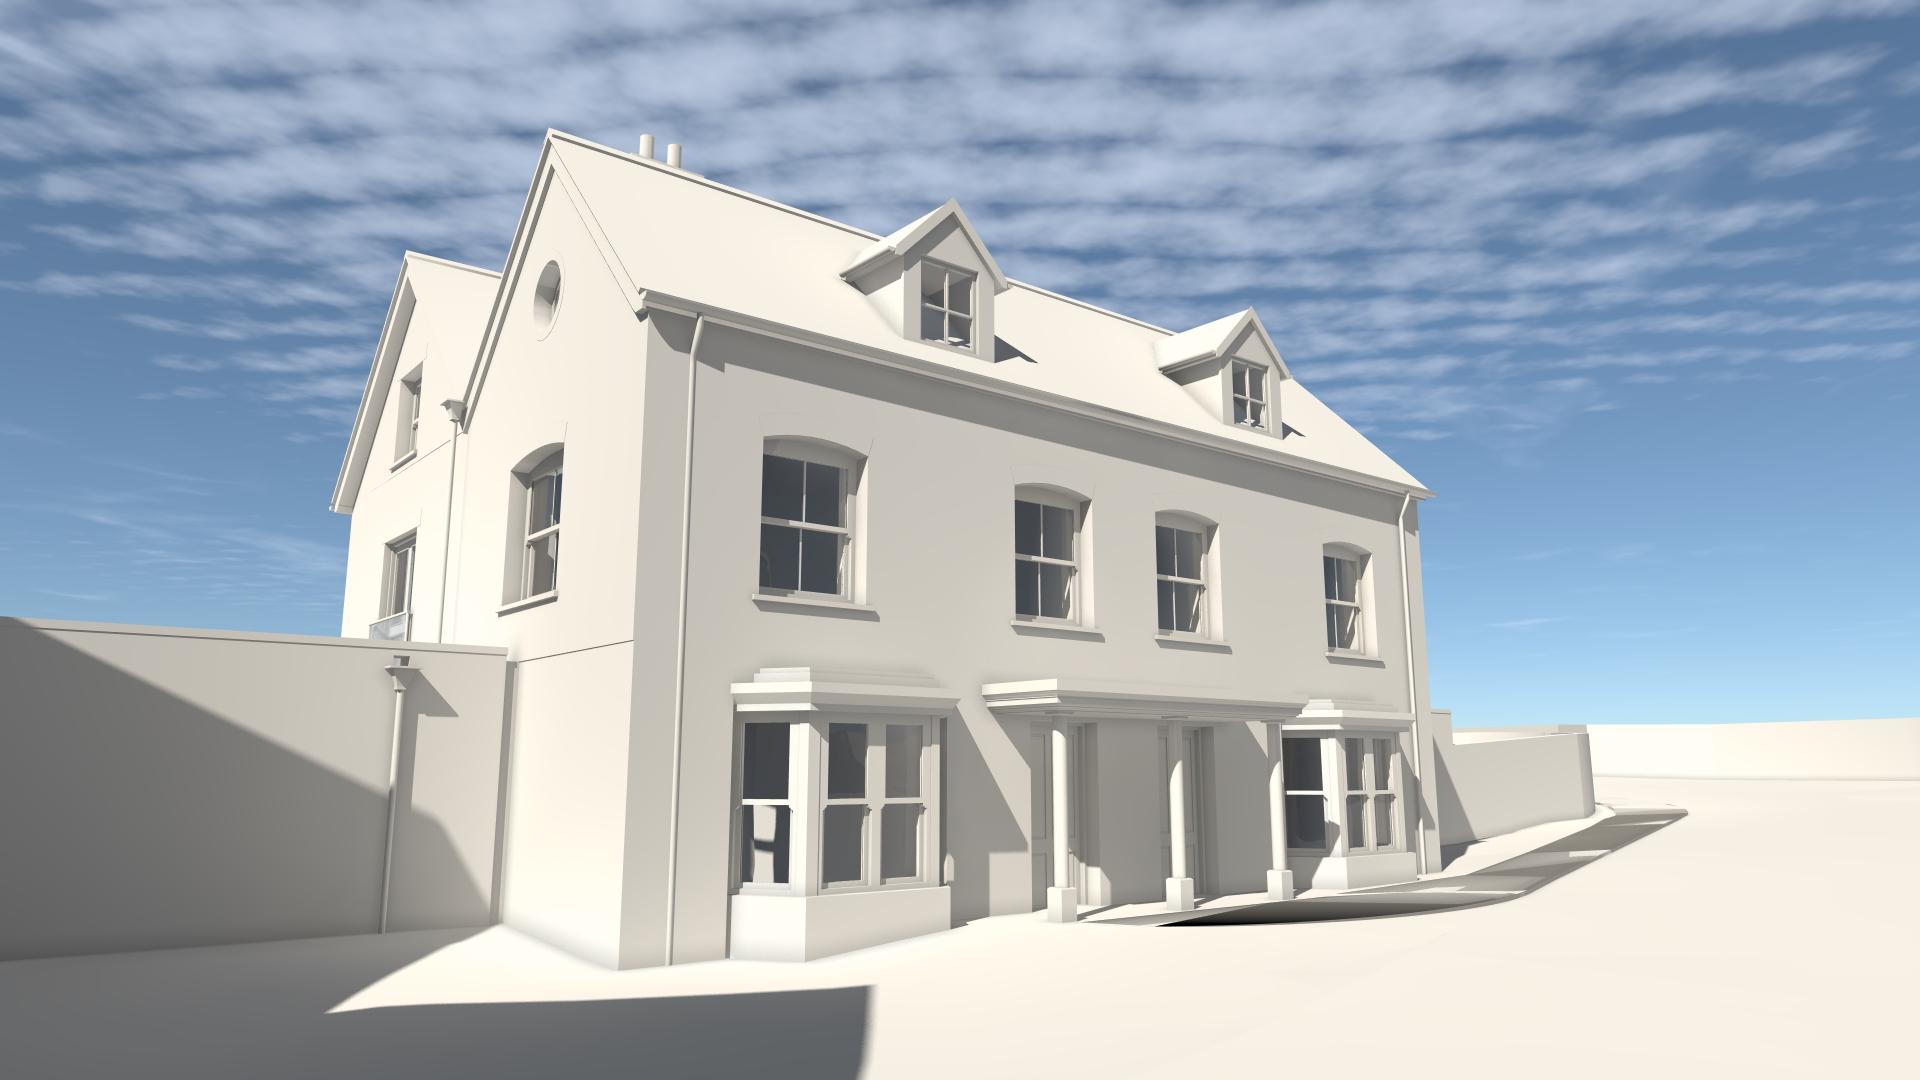 existing house2.jpg